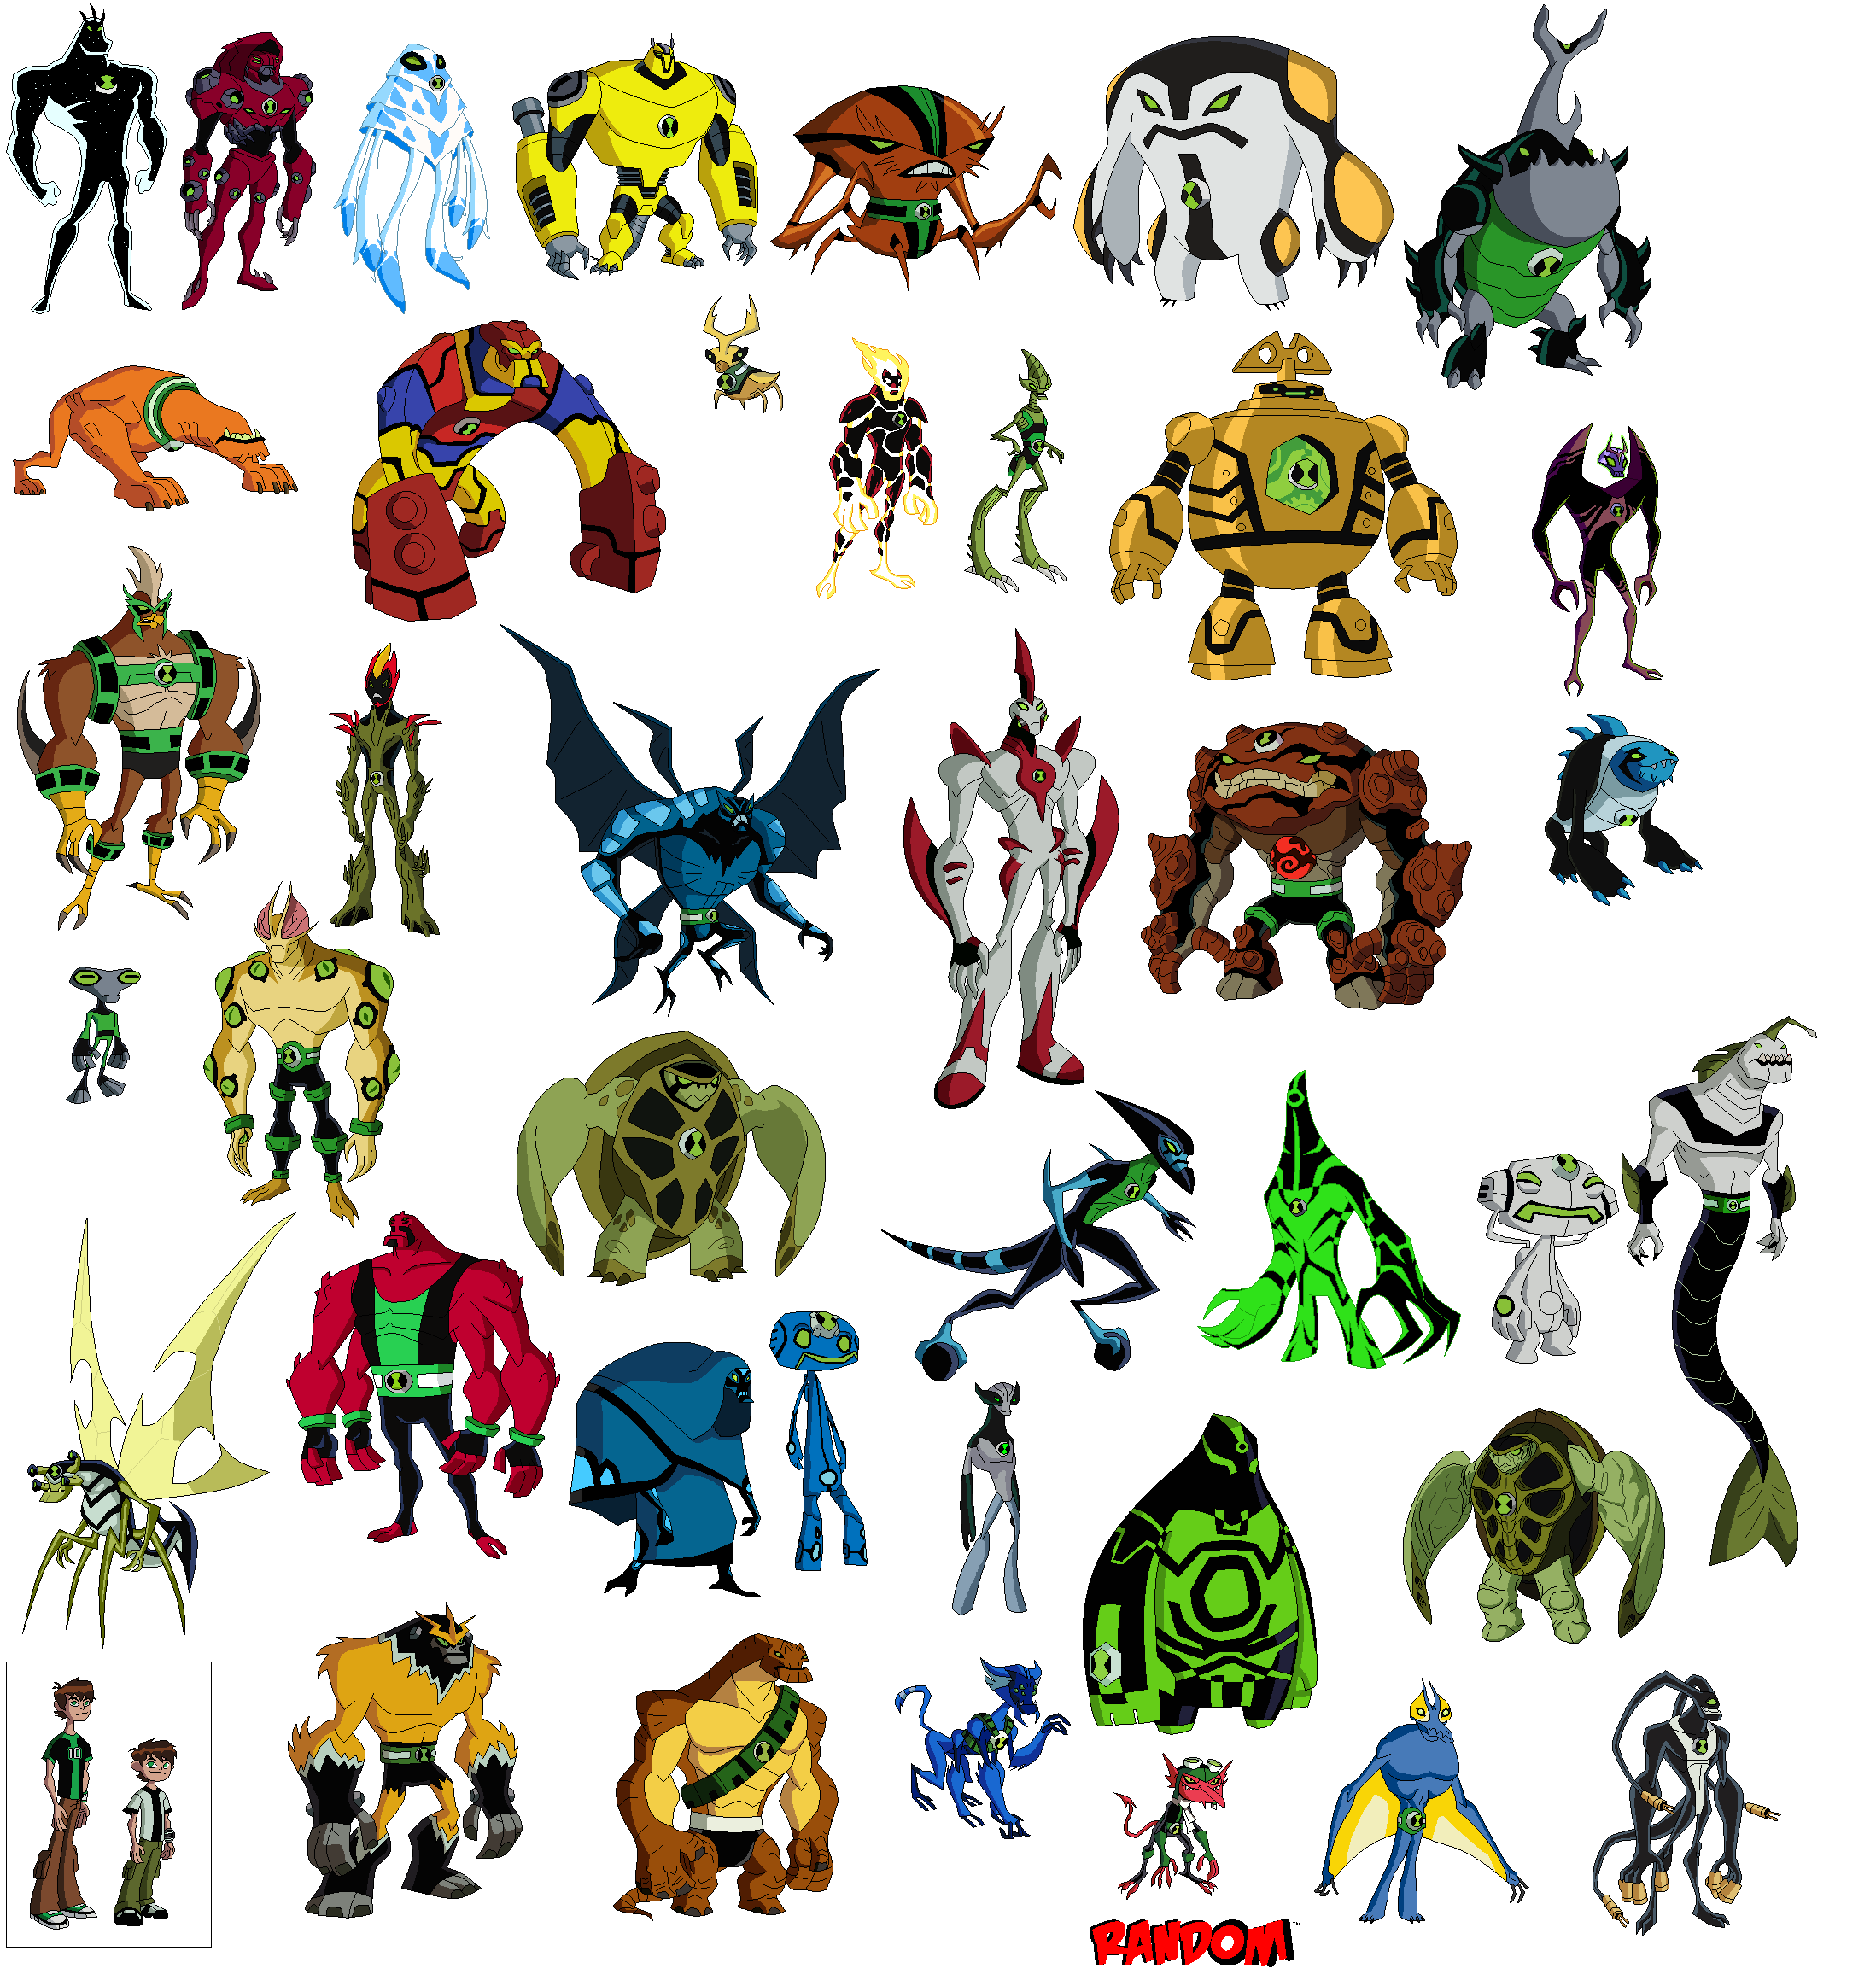 Imagem todos os aliens omniverseg universo ben 10 fandom todos os aliens omniverseg voltagebd Choice Image